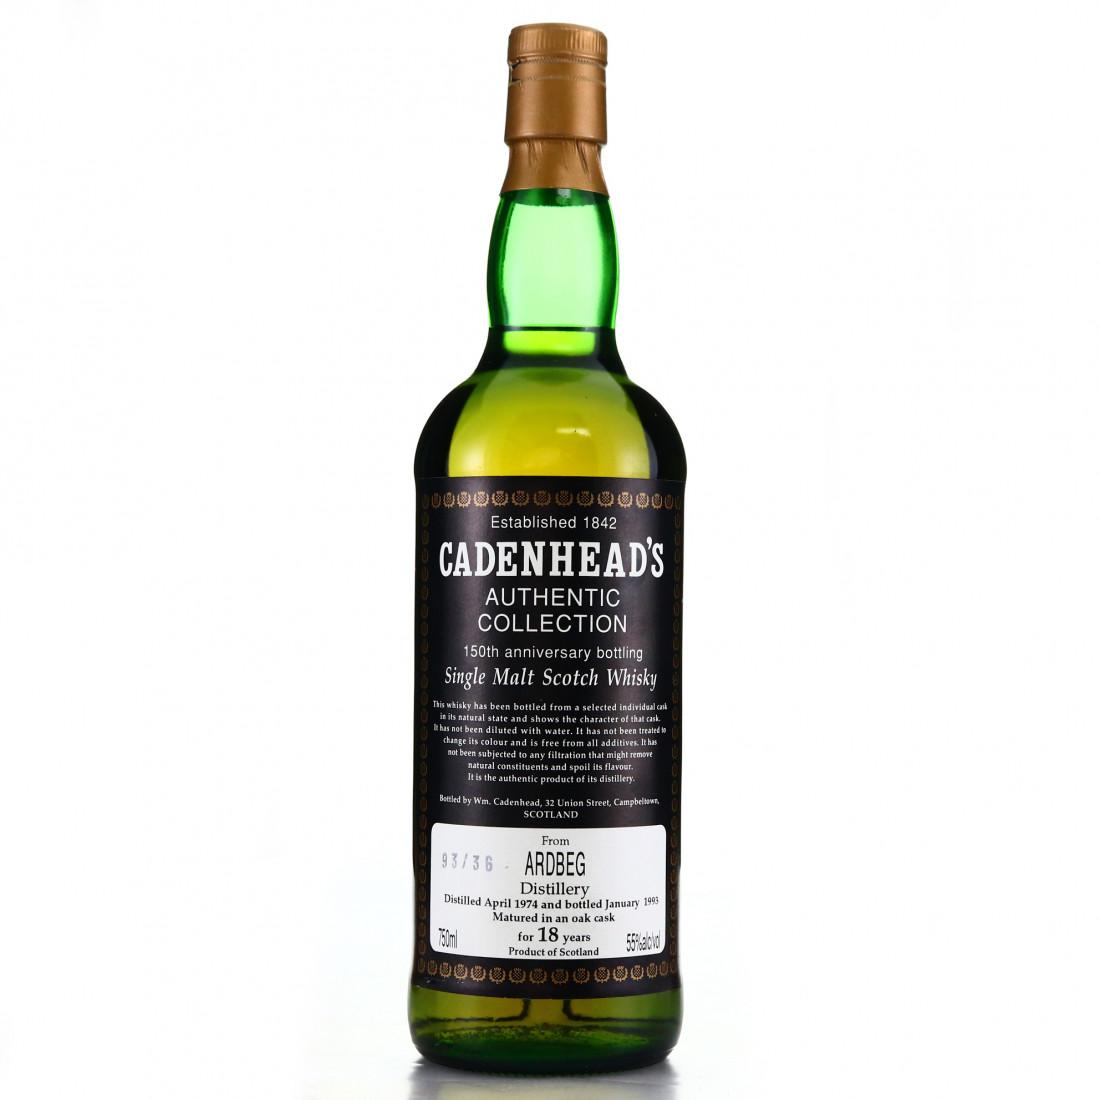 Ardbeg 1974 Cadenhead's 18 Year Old / 150th Anniversary